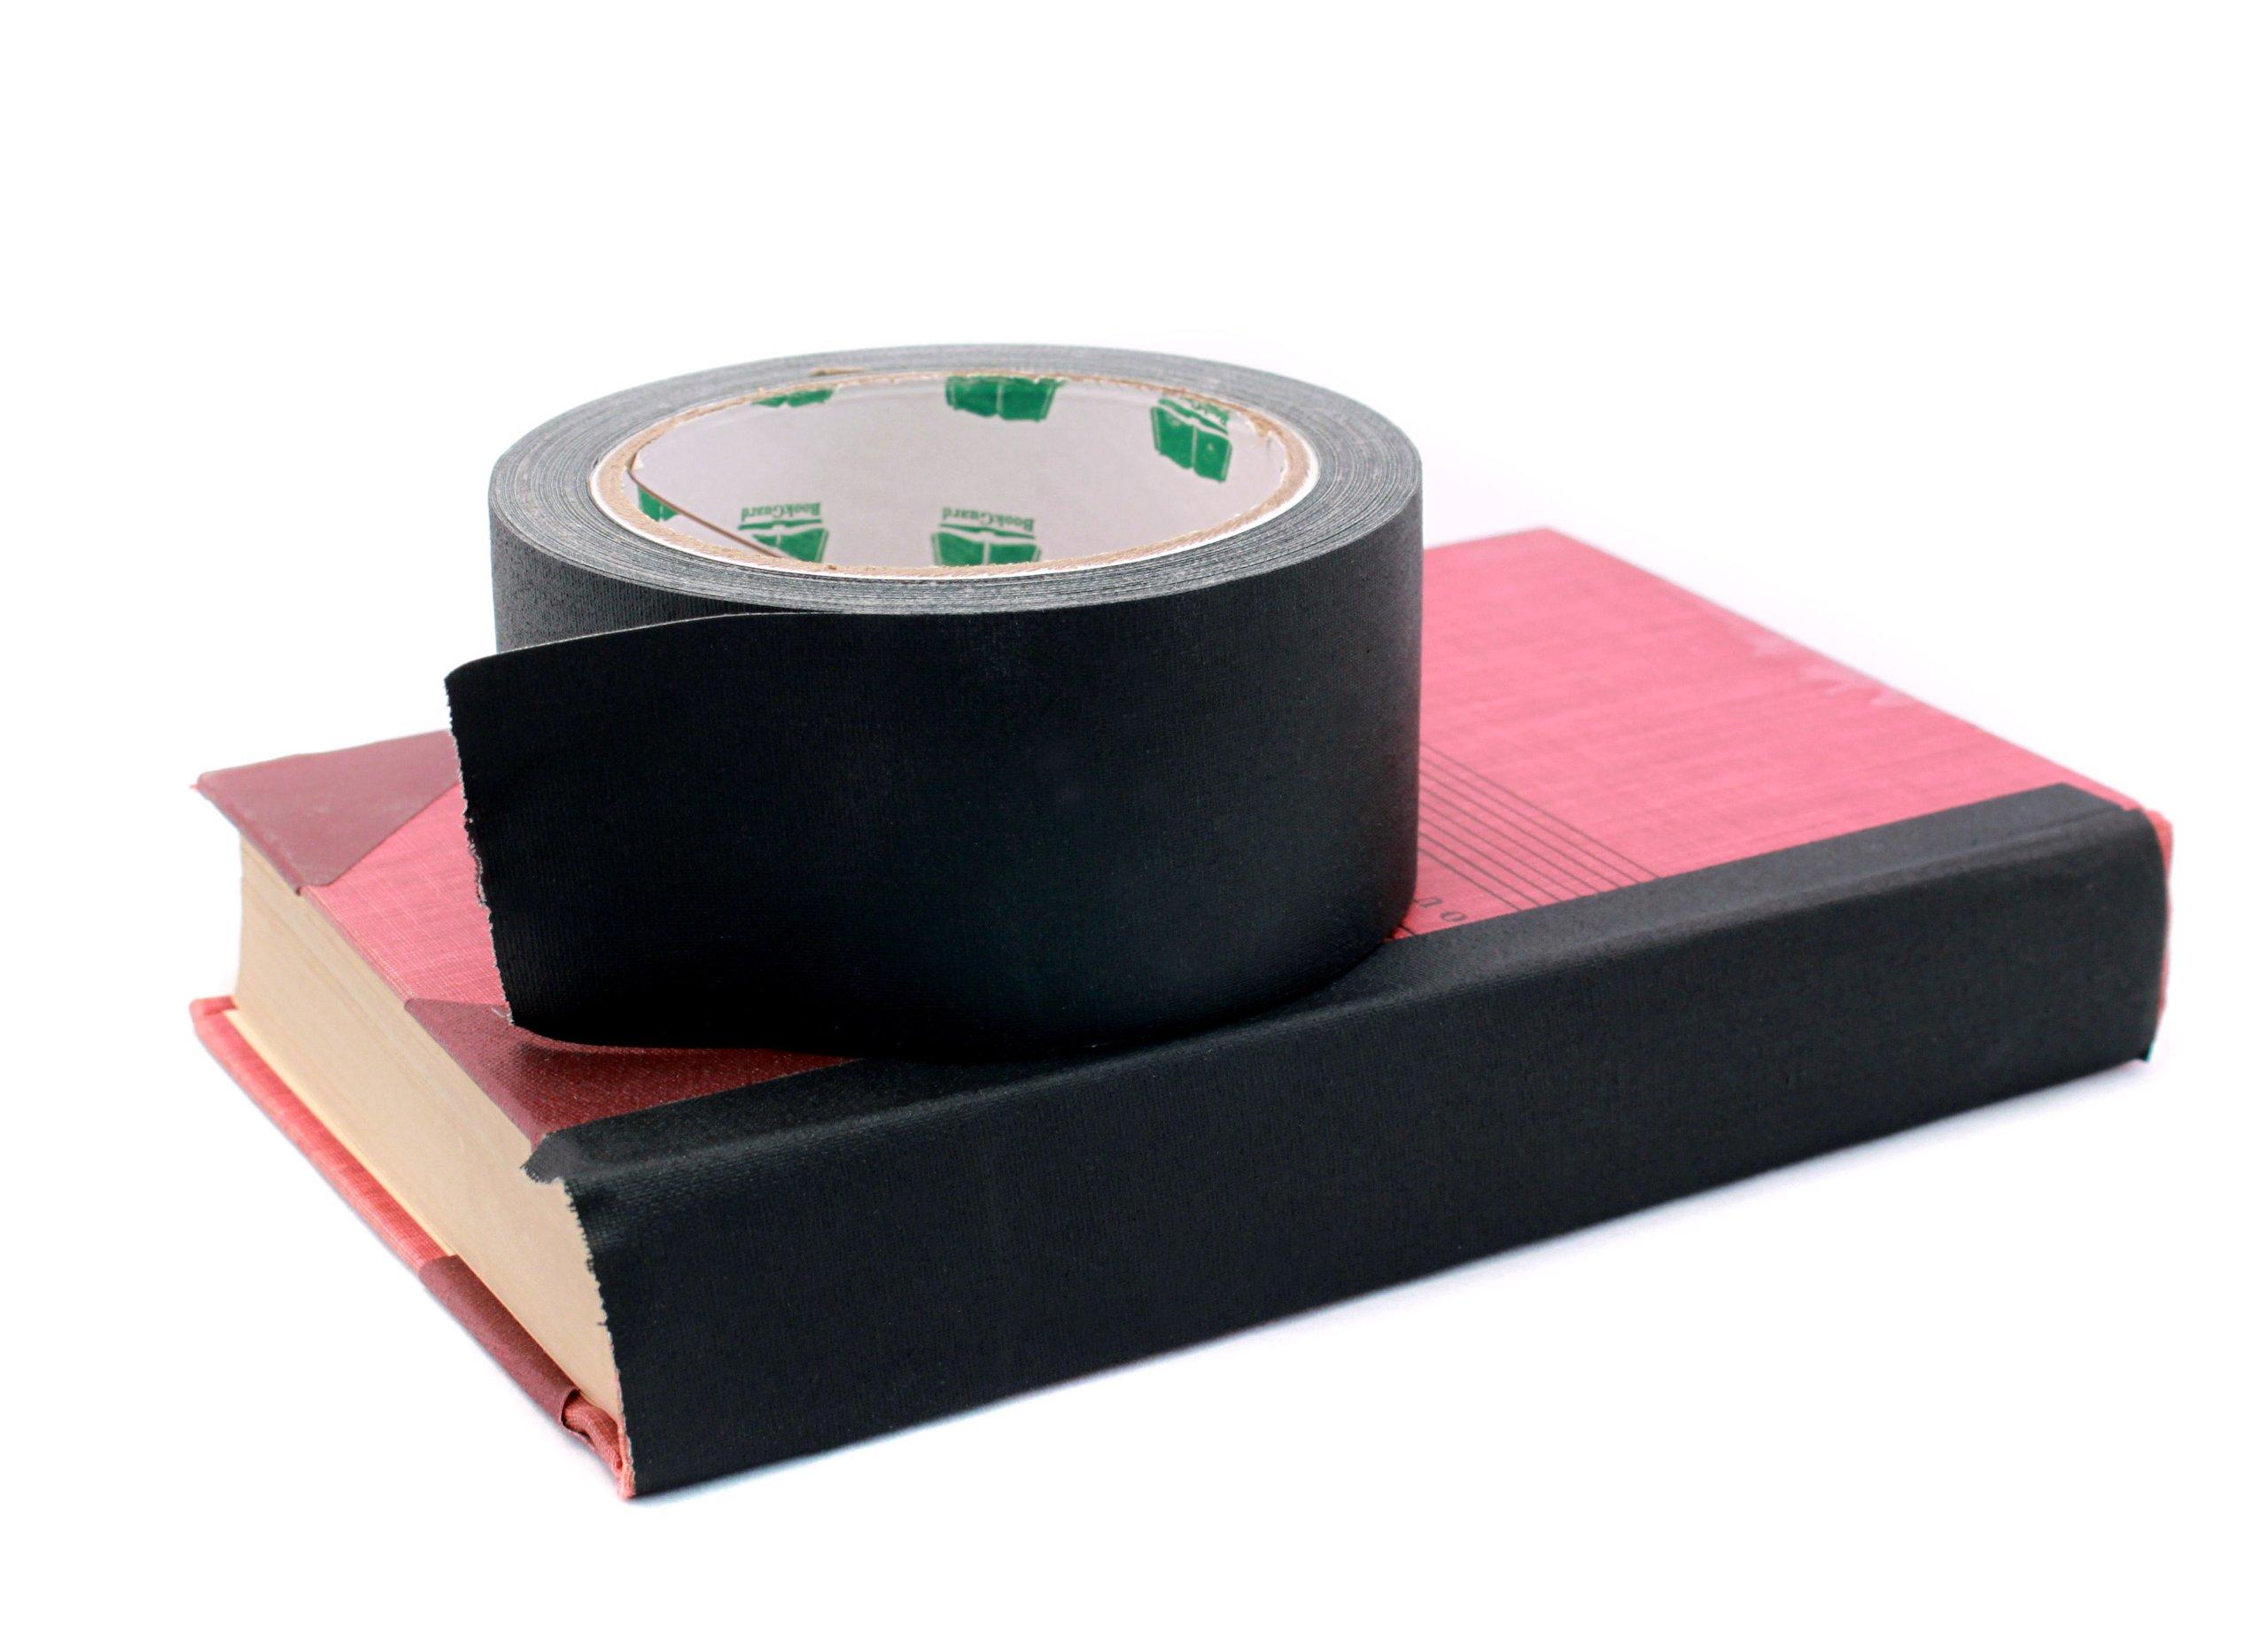 2'' Brown Colored Premium-Cloth Book Binding Repair Tape | 15 Yard Roll (BookGuard Brand) by Chromalabel.com (Image #2)